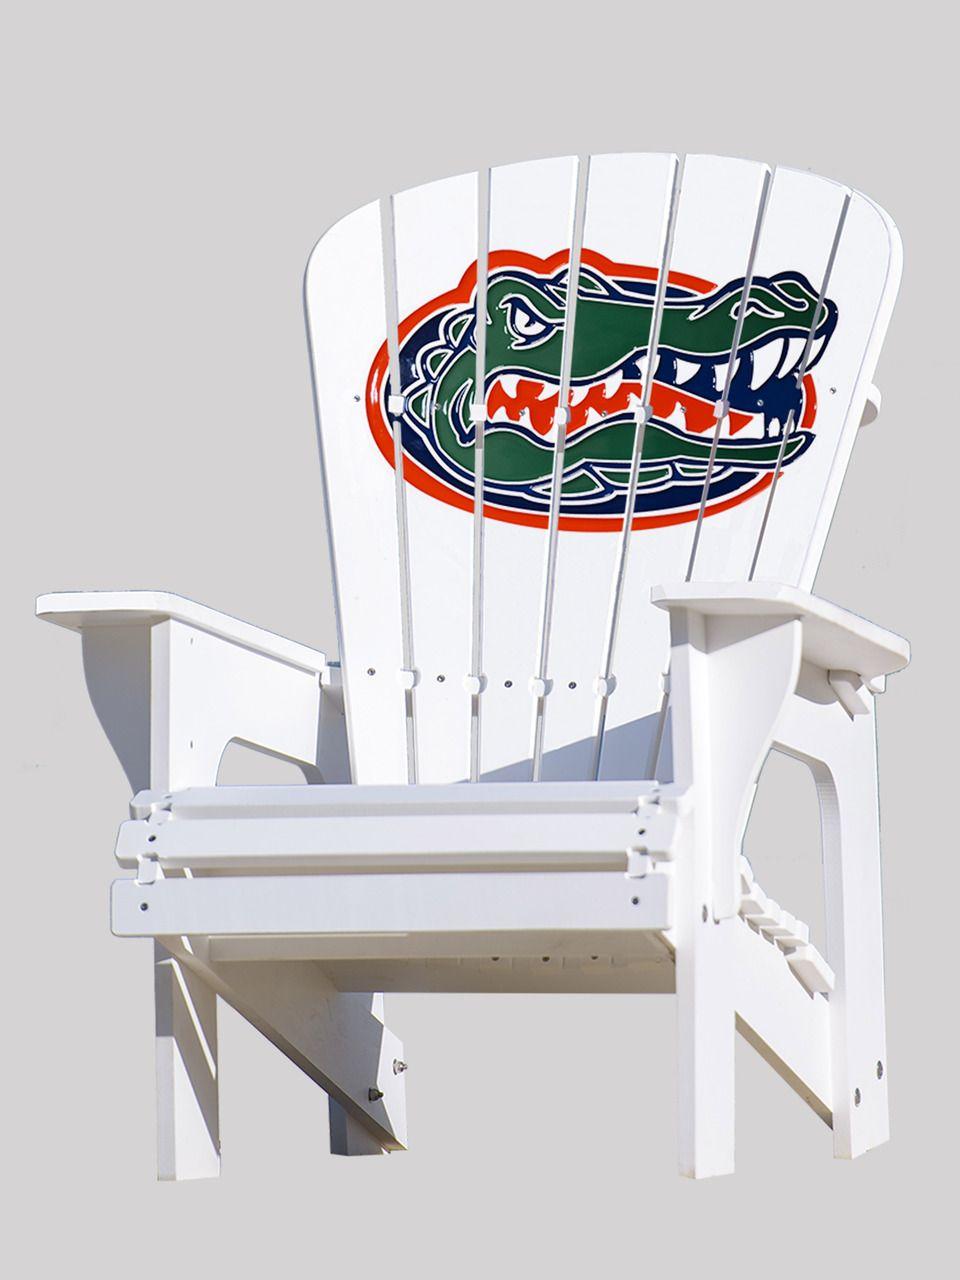 University Of Florida Gators Adirondack Chair Patio Chairs